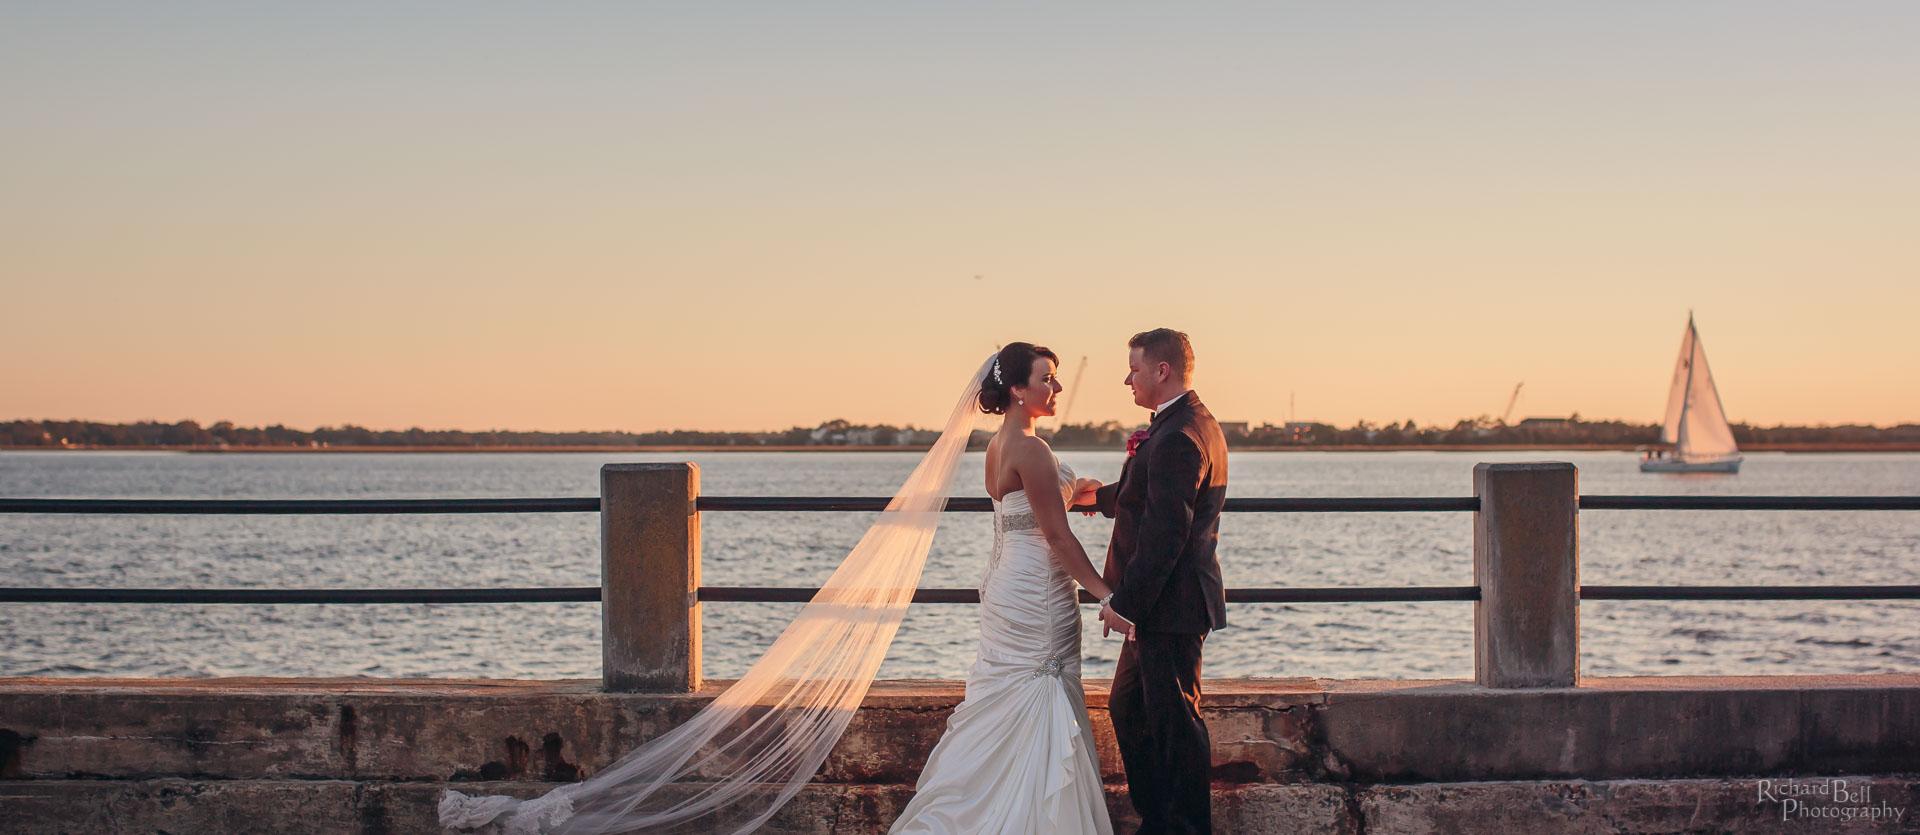 Bride and Groom at Charleston Battery